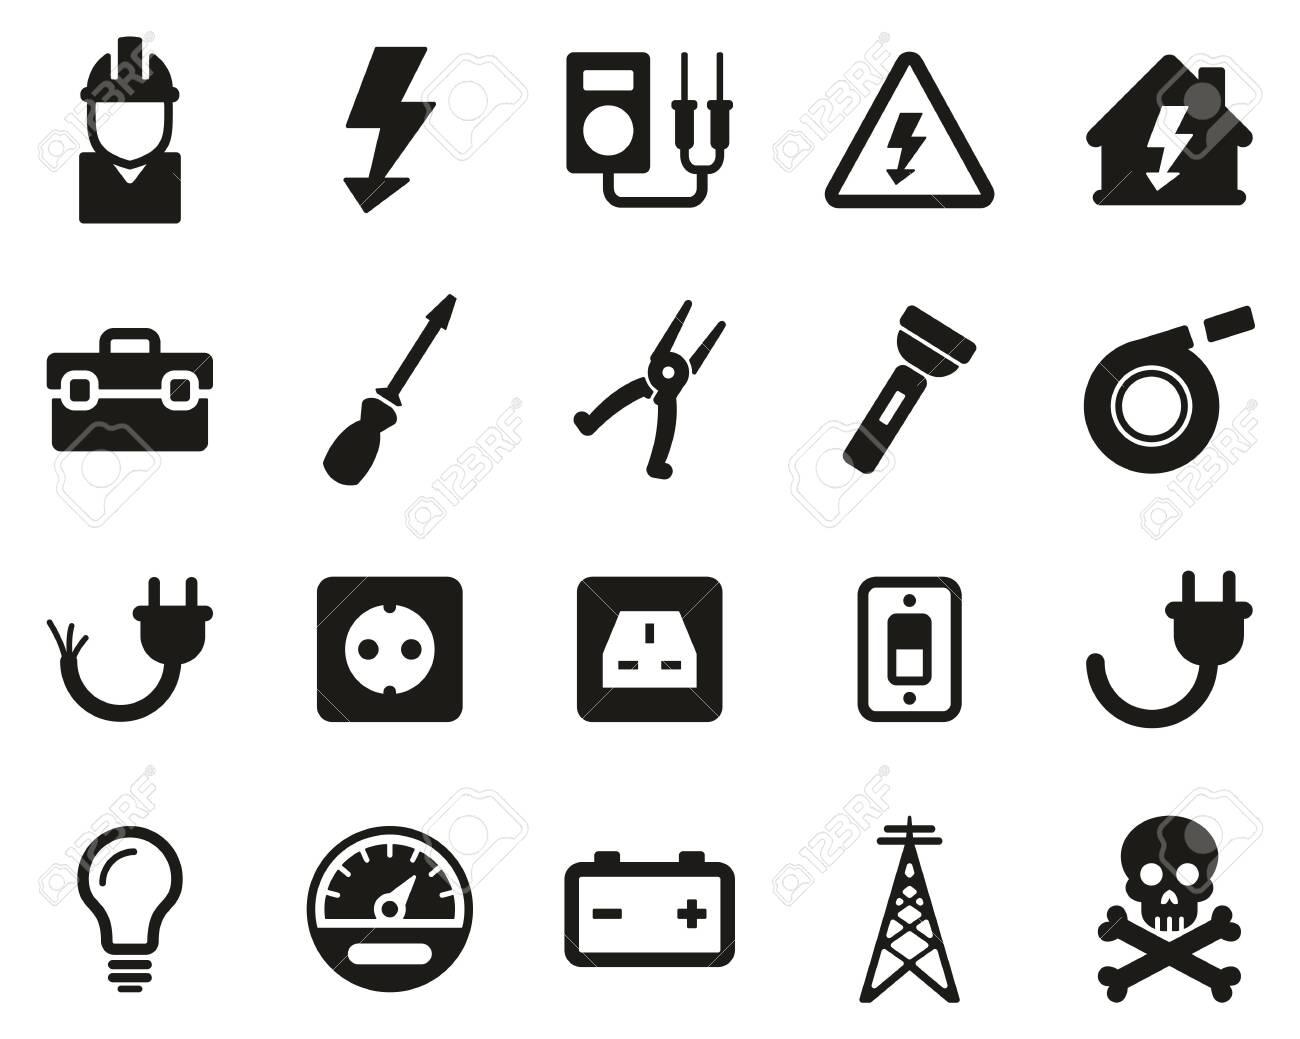 Electrician Tools & Equipment Icons Black & White Set Big - 138085864